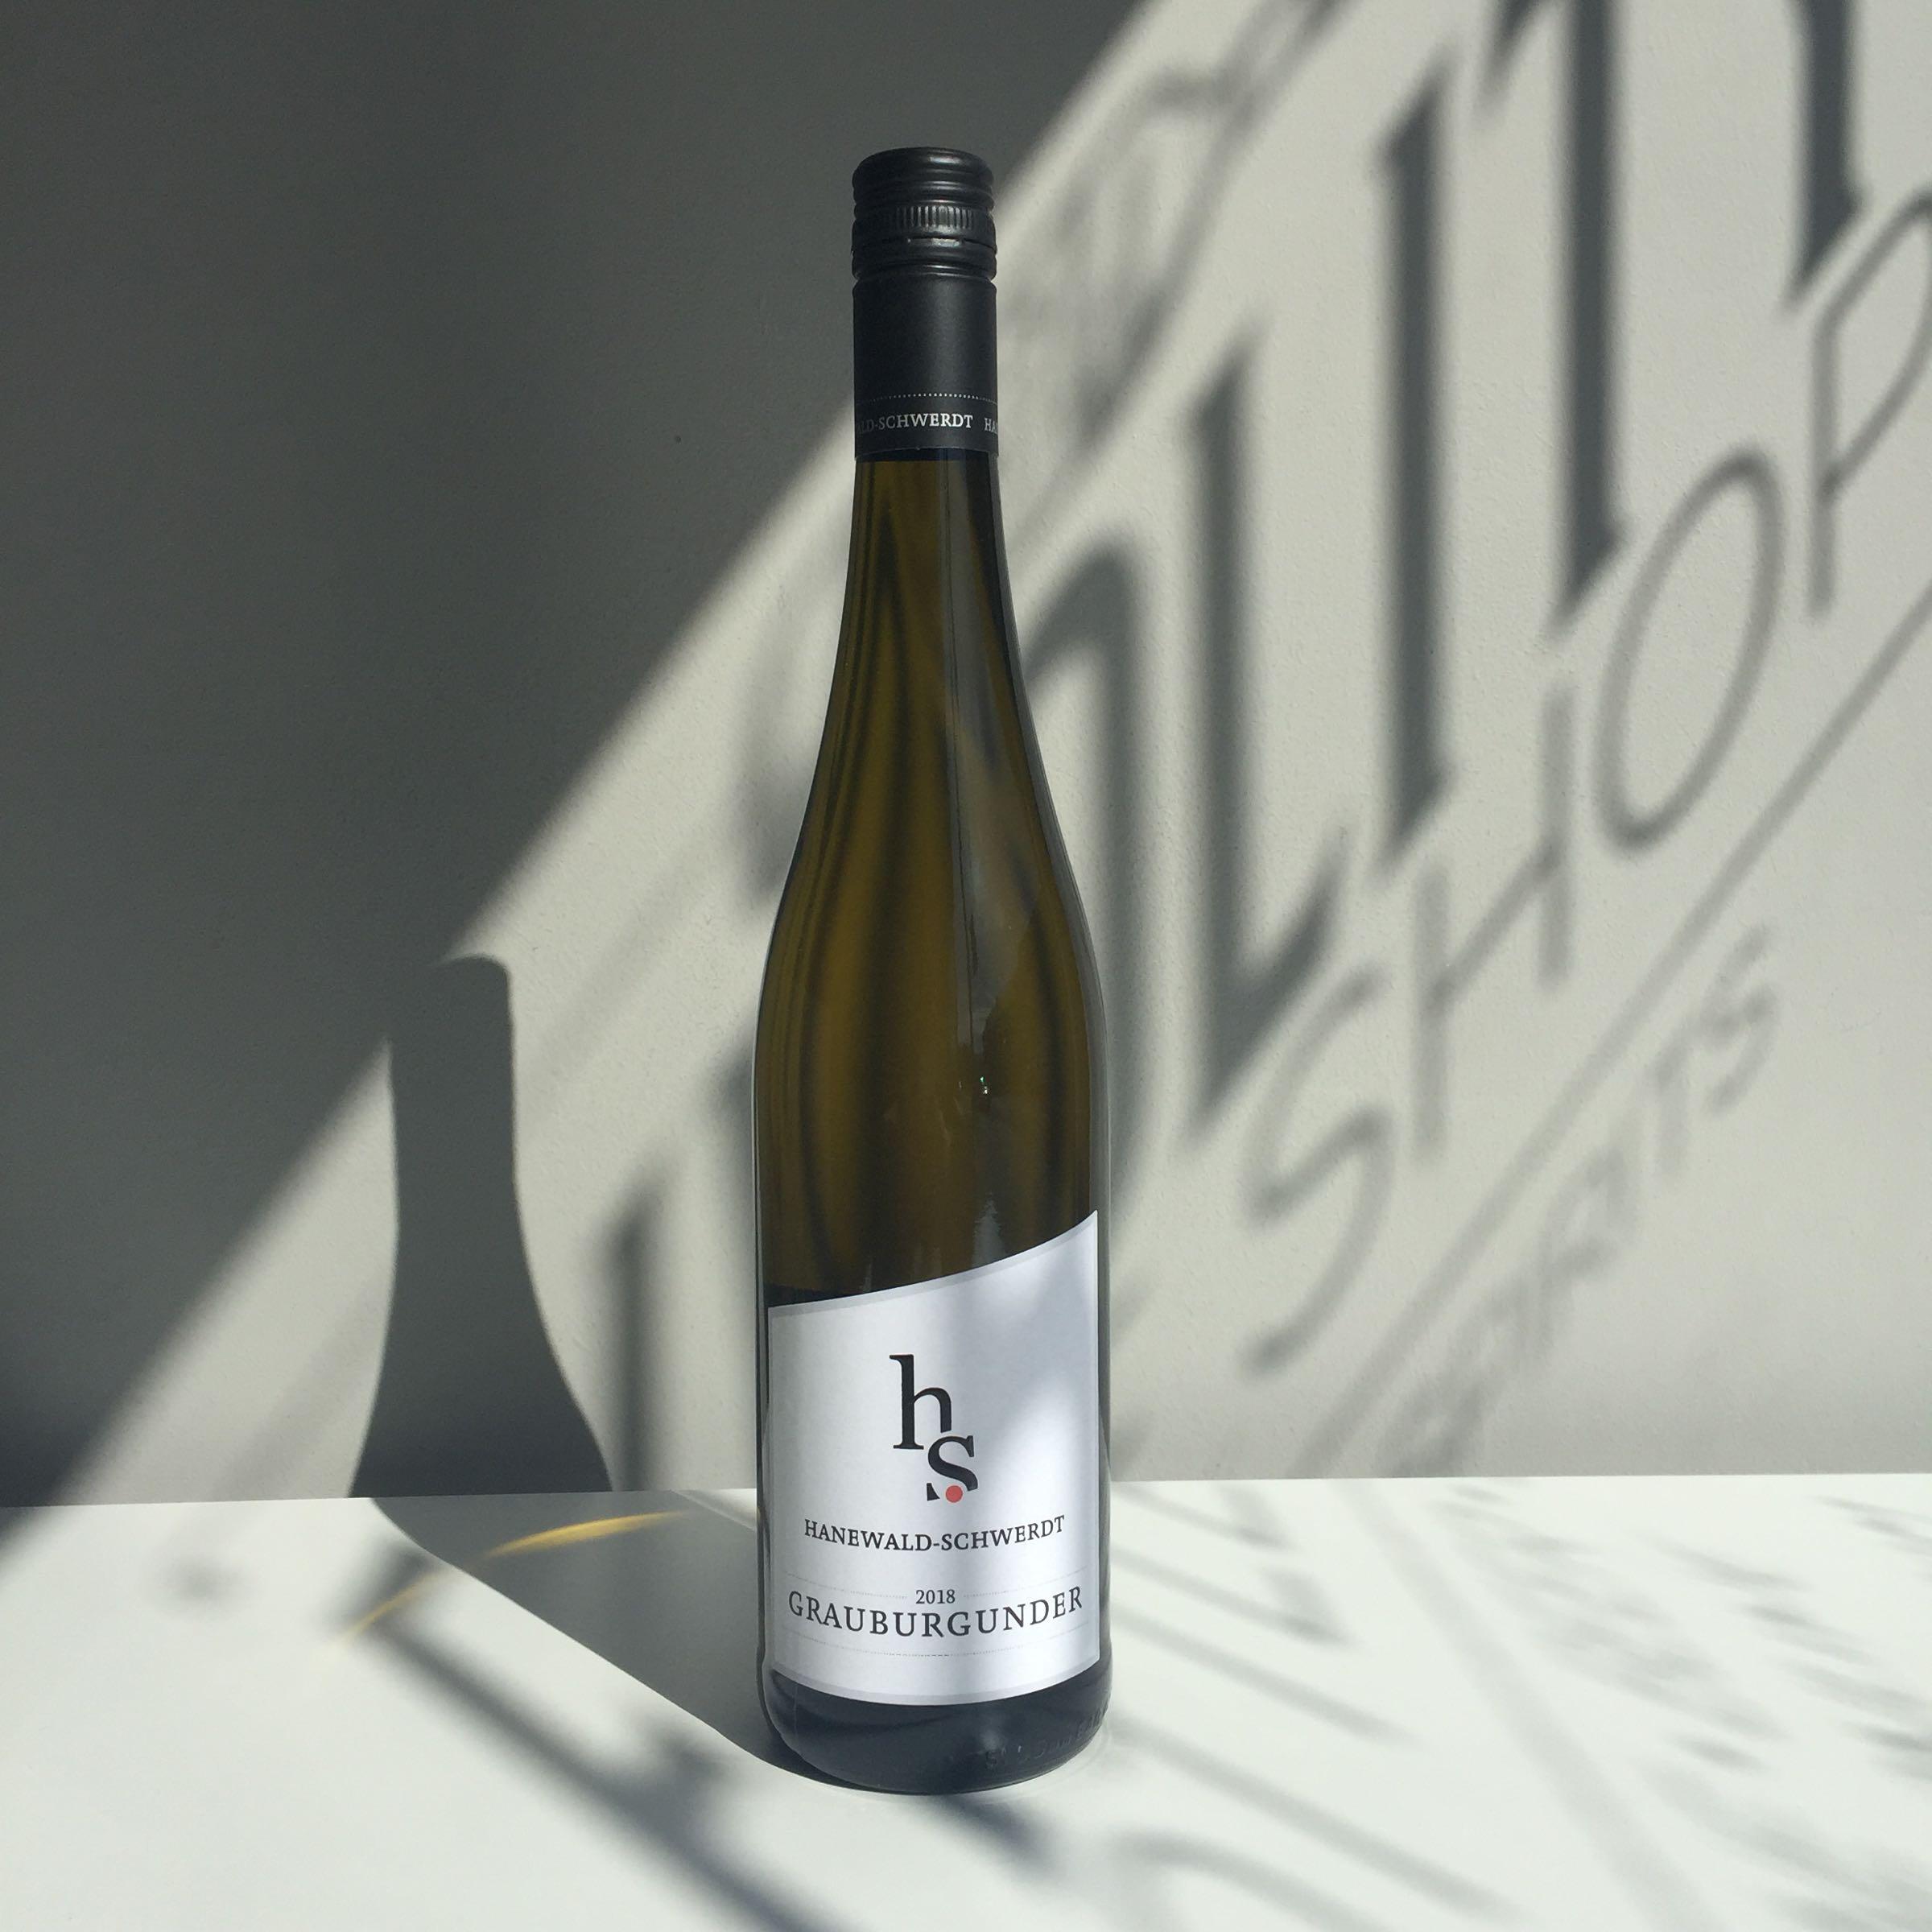 Hanewald-Schwerdt - Grauburgunder (Pinot Gris) 2018